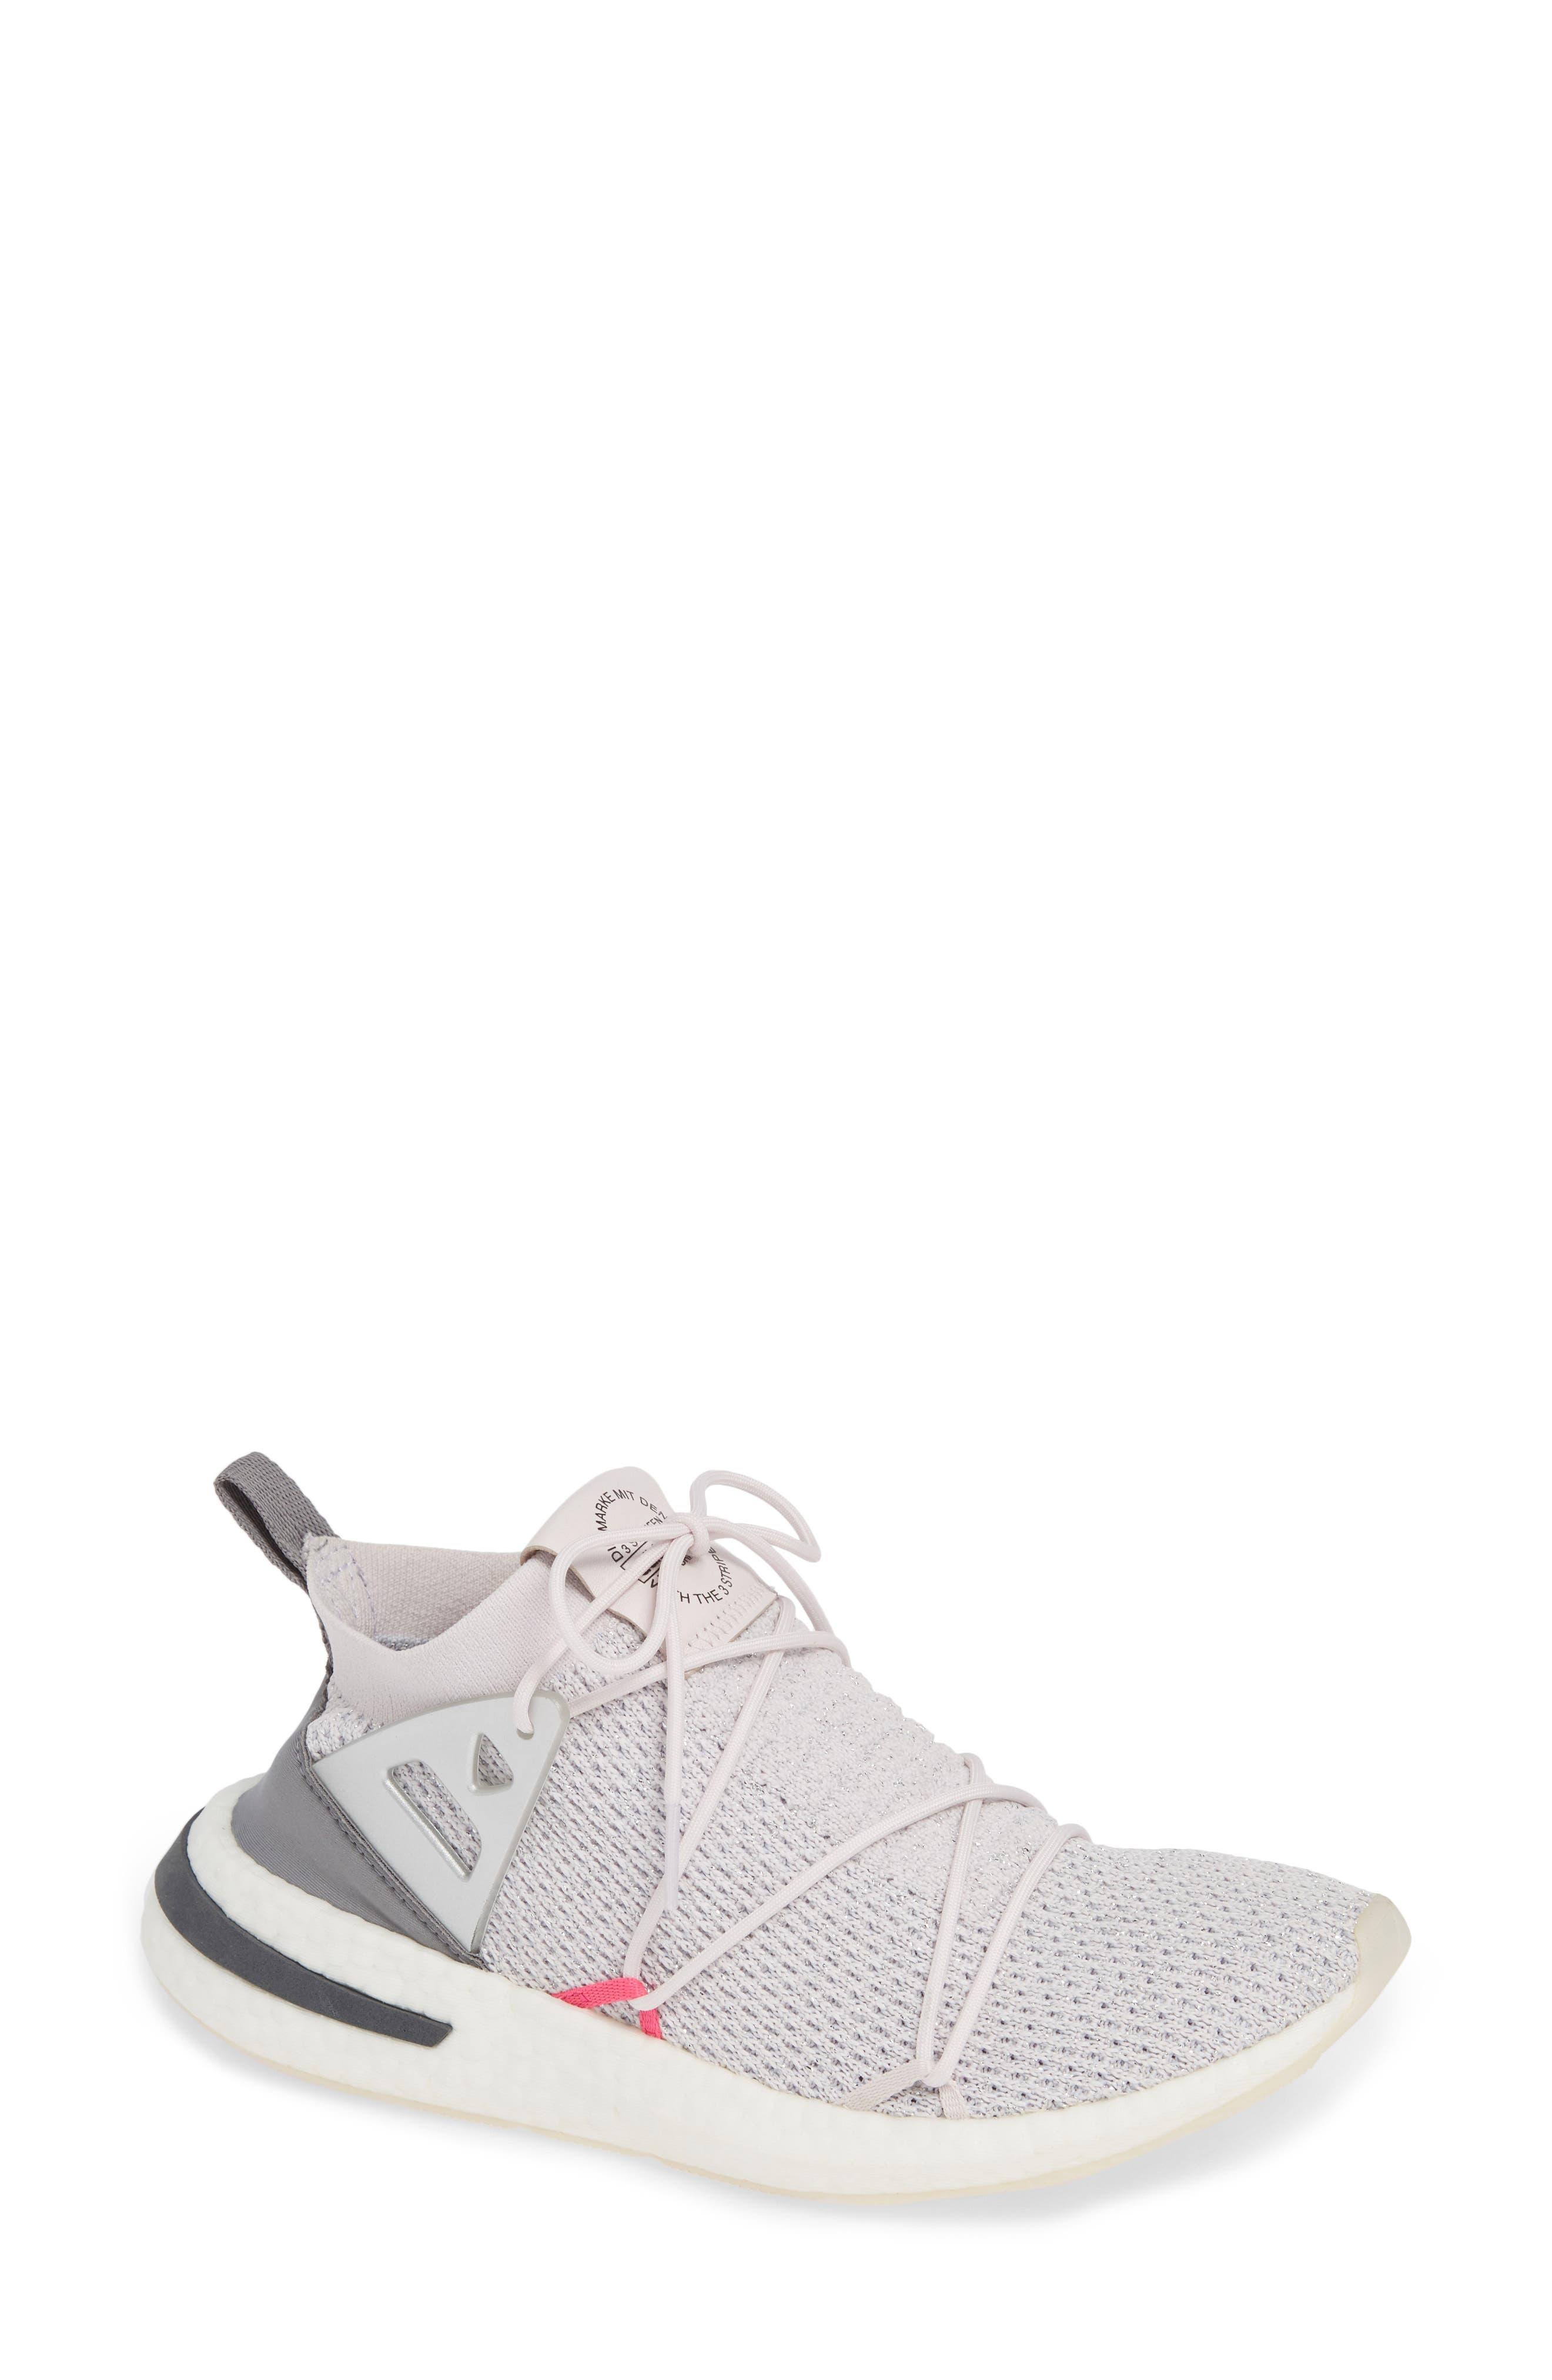 Arkyn Primeknit Sneaker, Main, color, 021